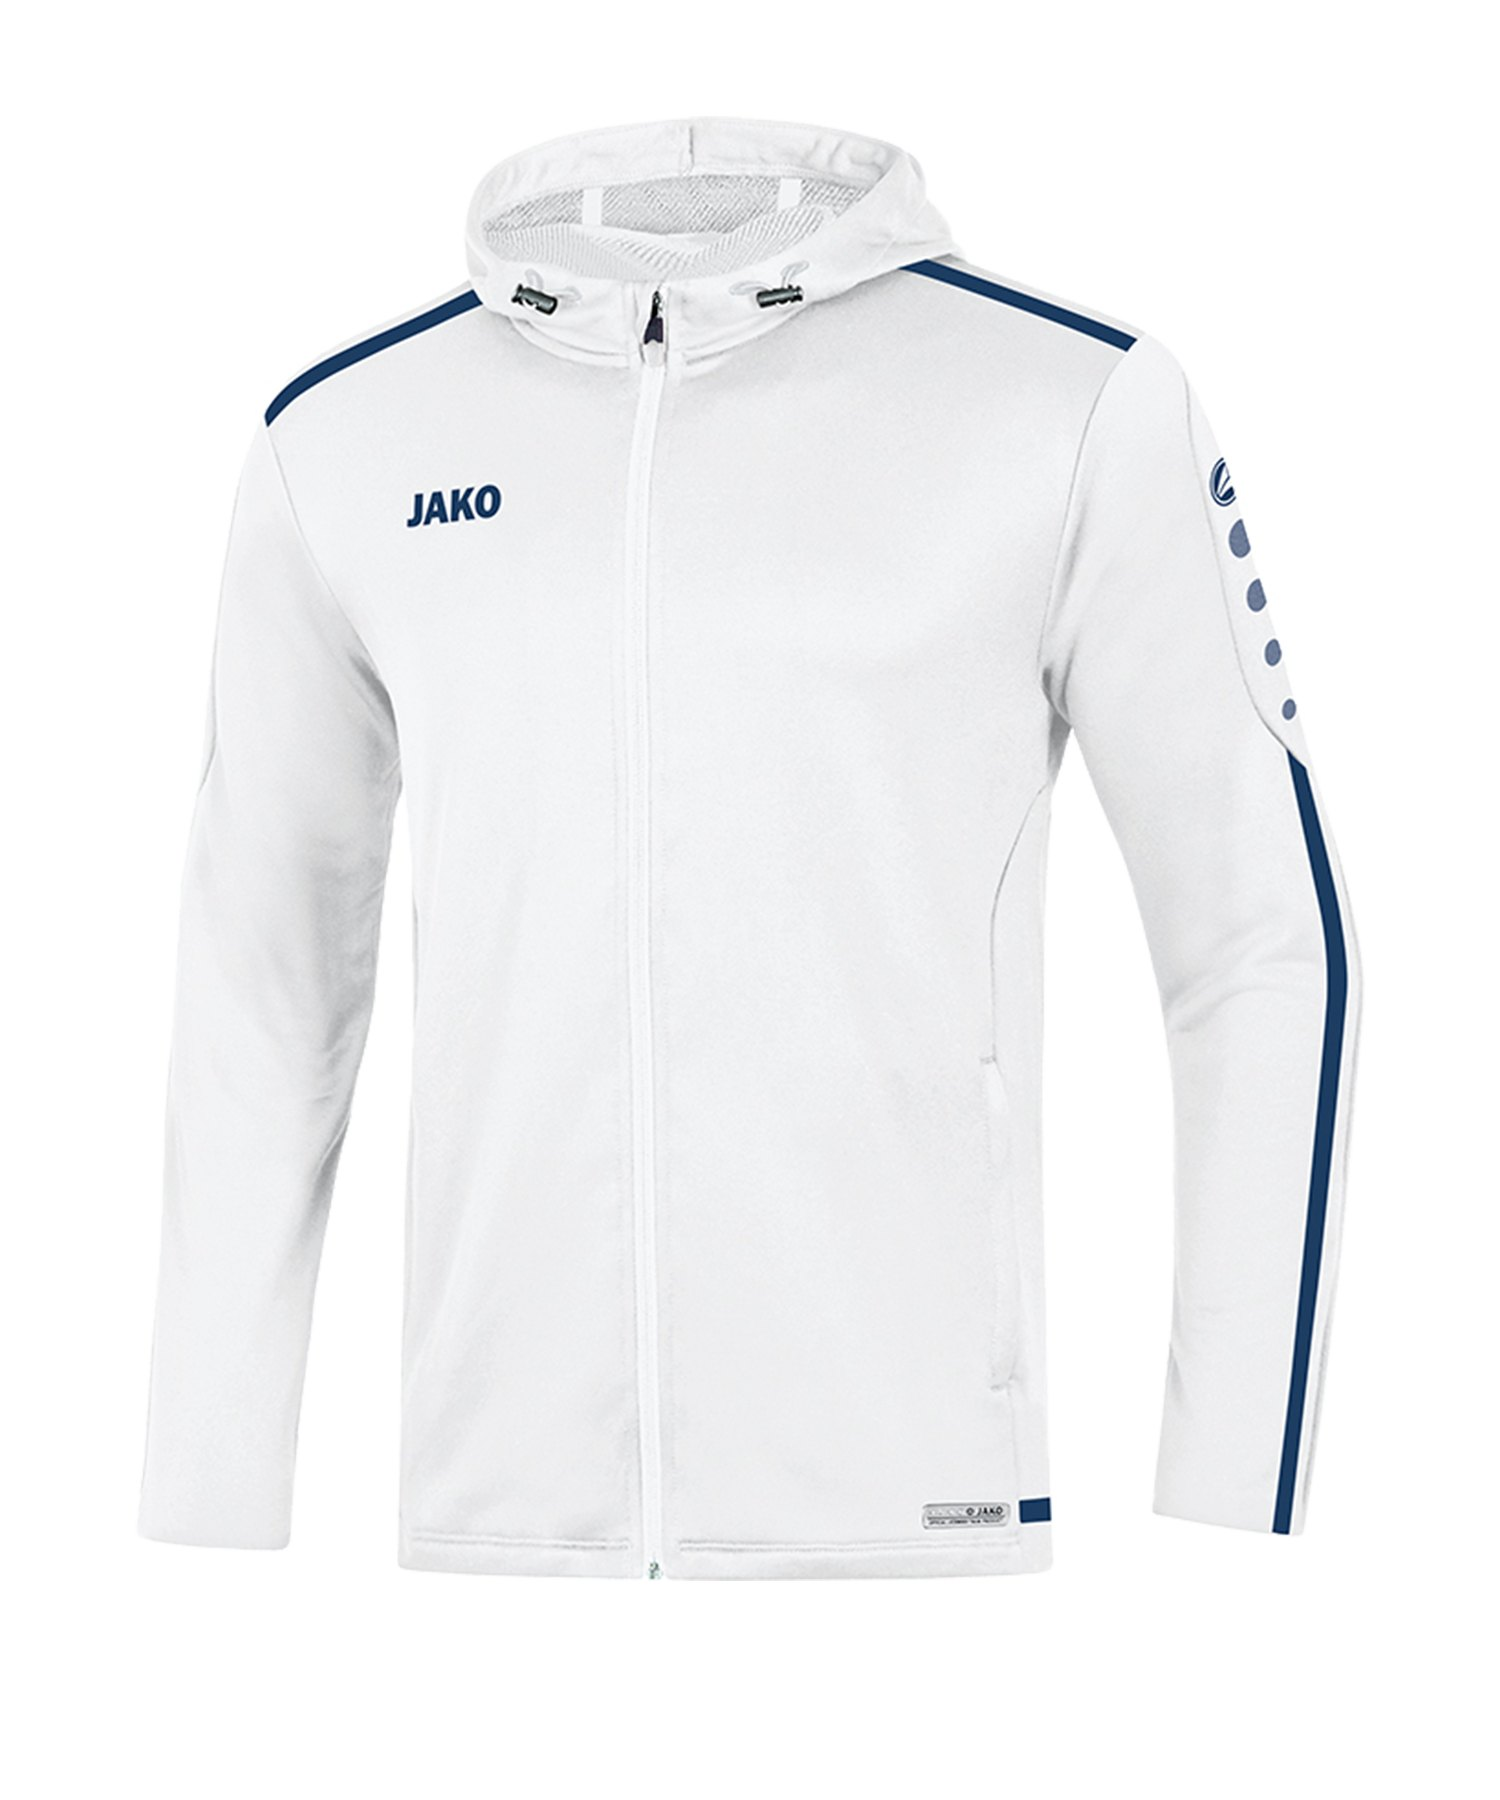 Jako Striker 2.0 Kapuzenjacke Weiss Blau F90 - Weiss